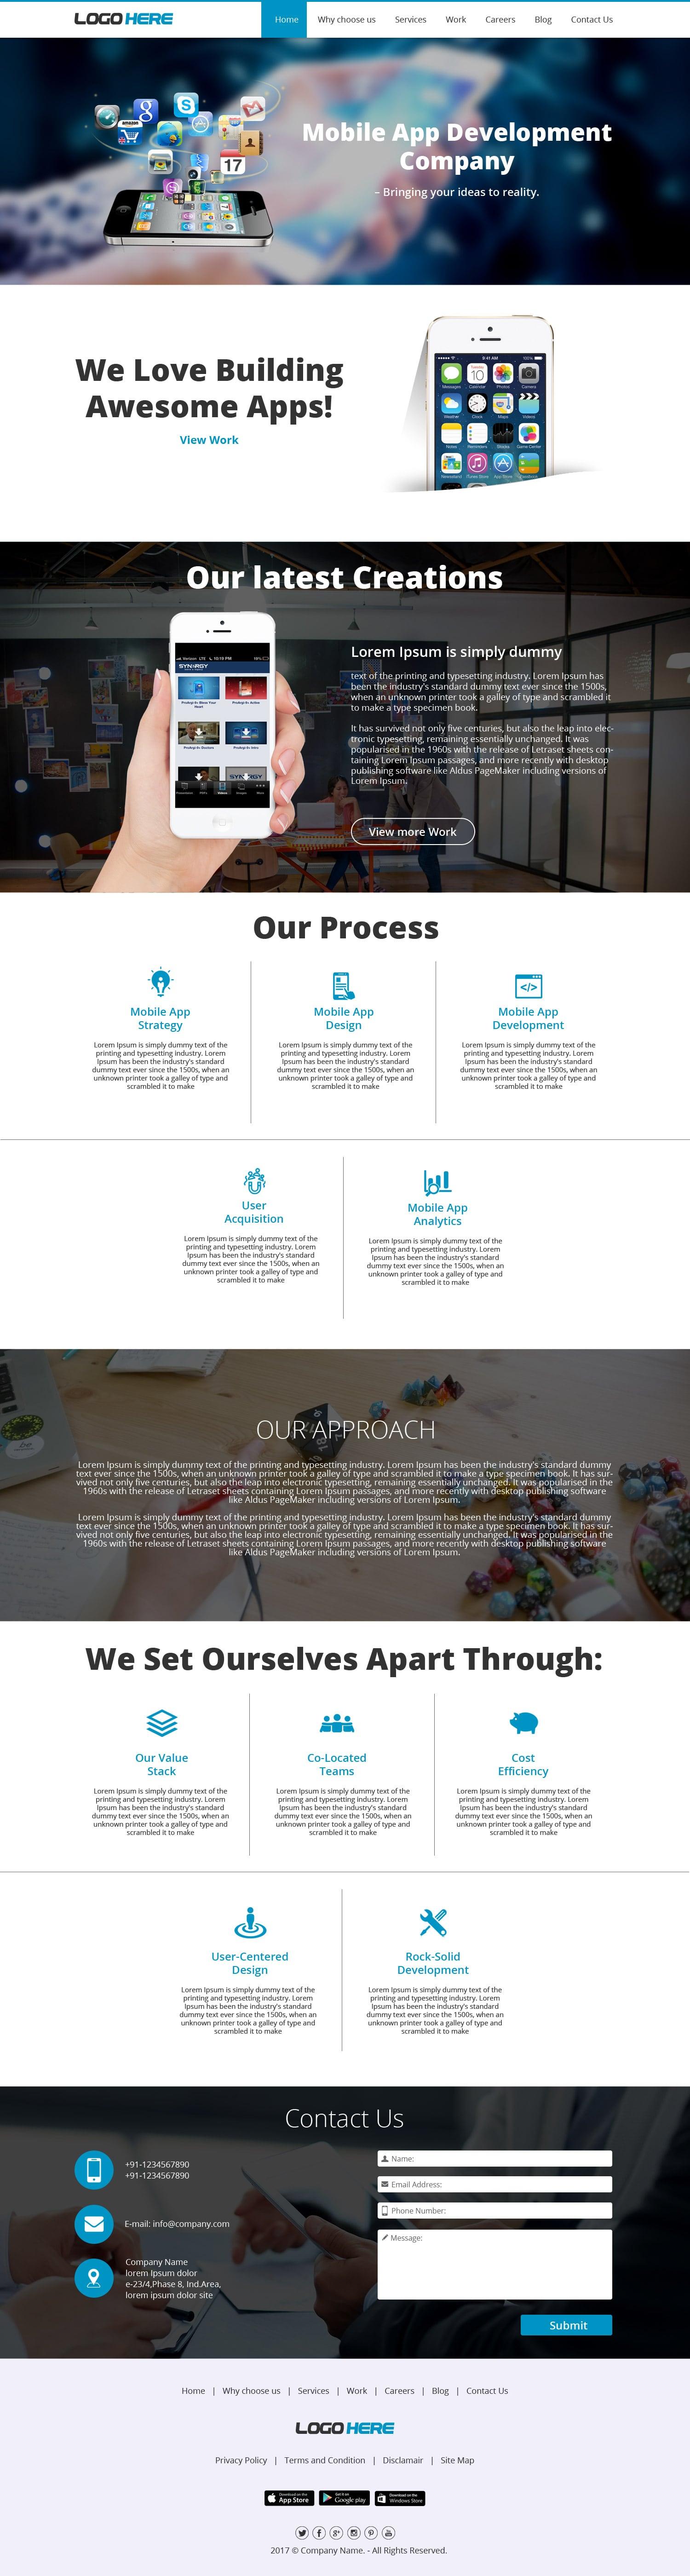 Mobile app development company website template